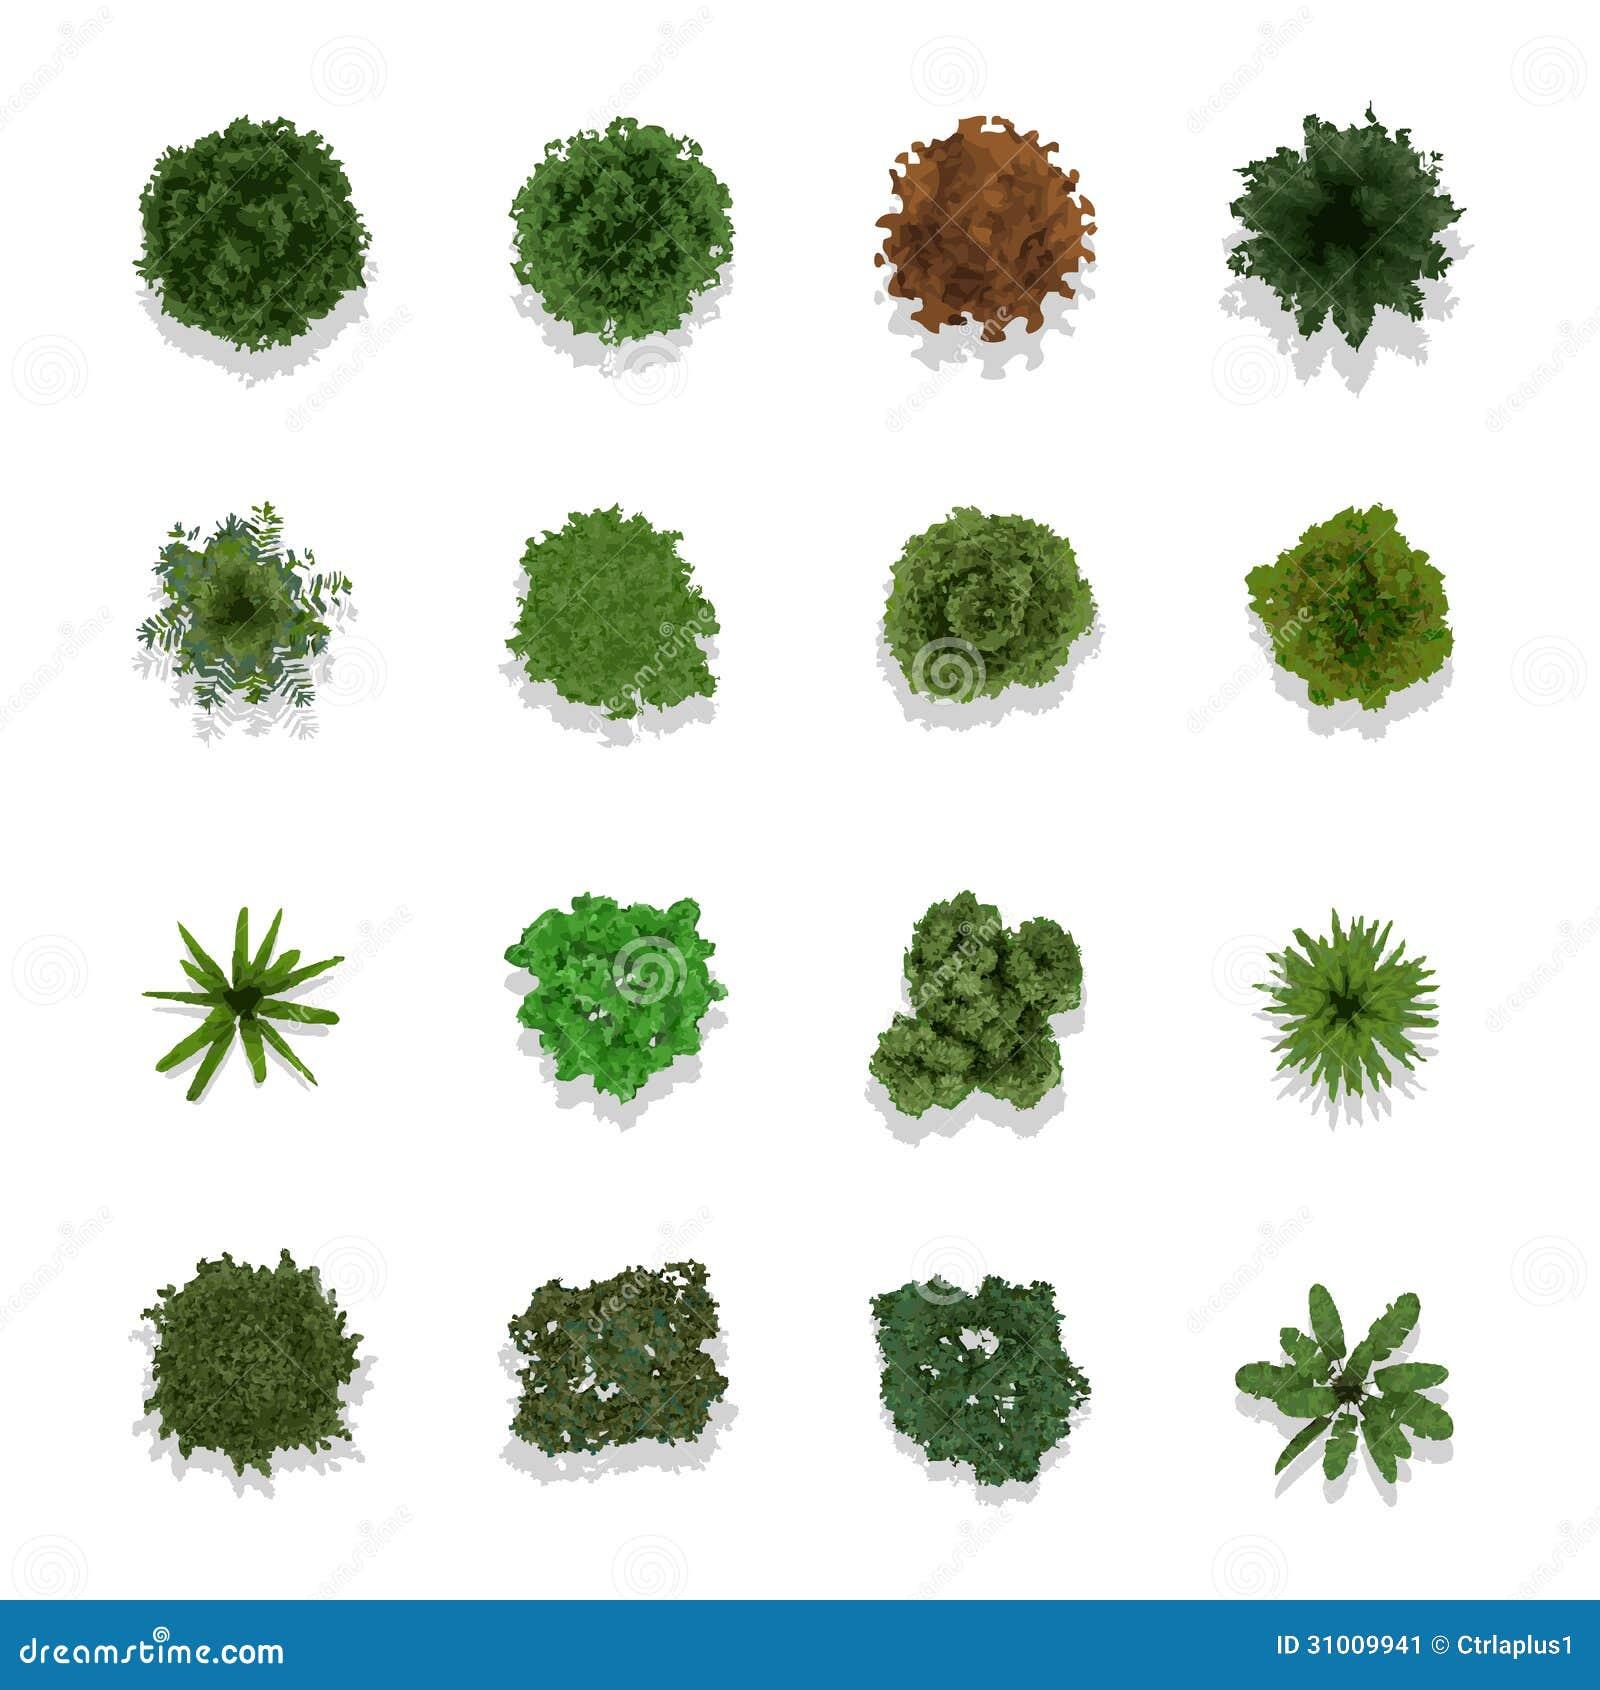 Landscape Illustration Vector Free: Trees Top View For Landscape Stock Image